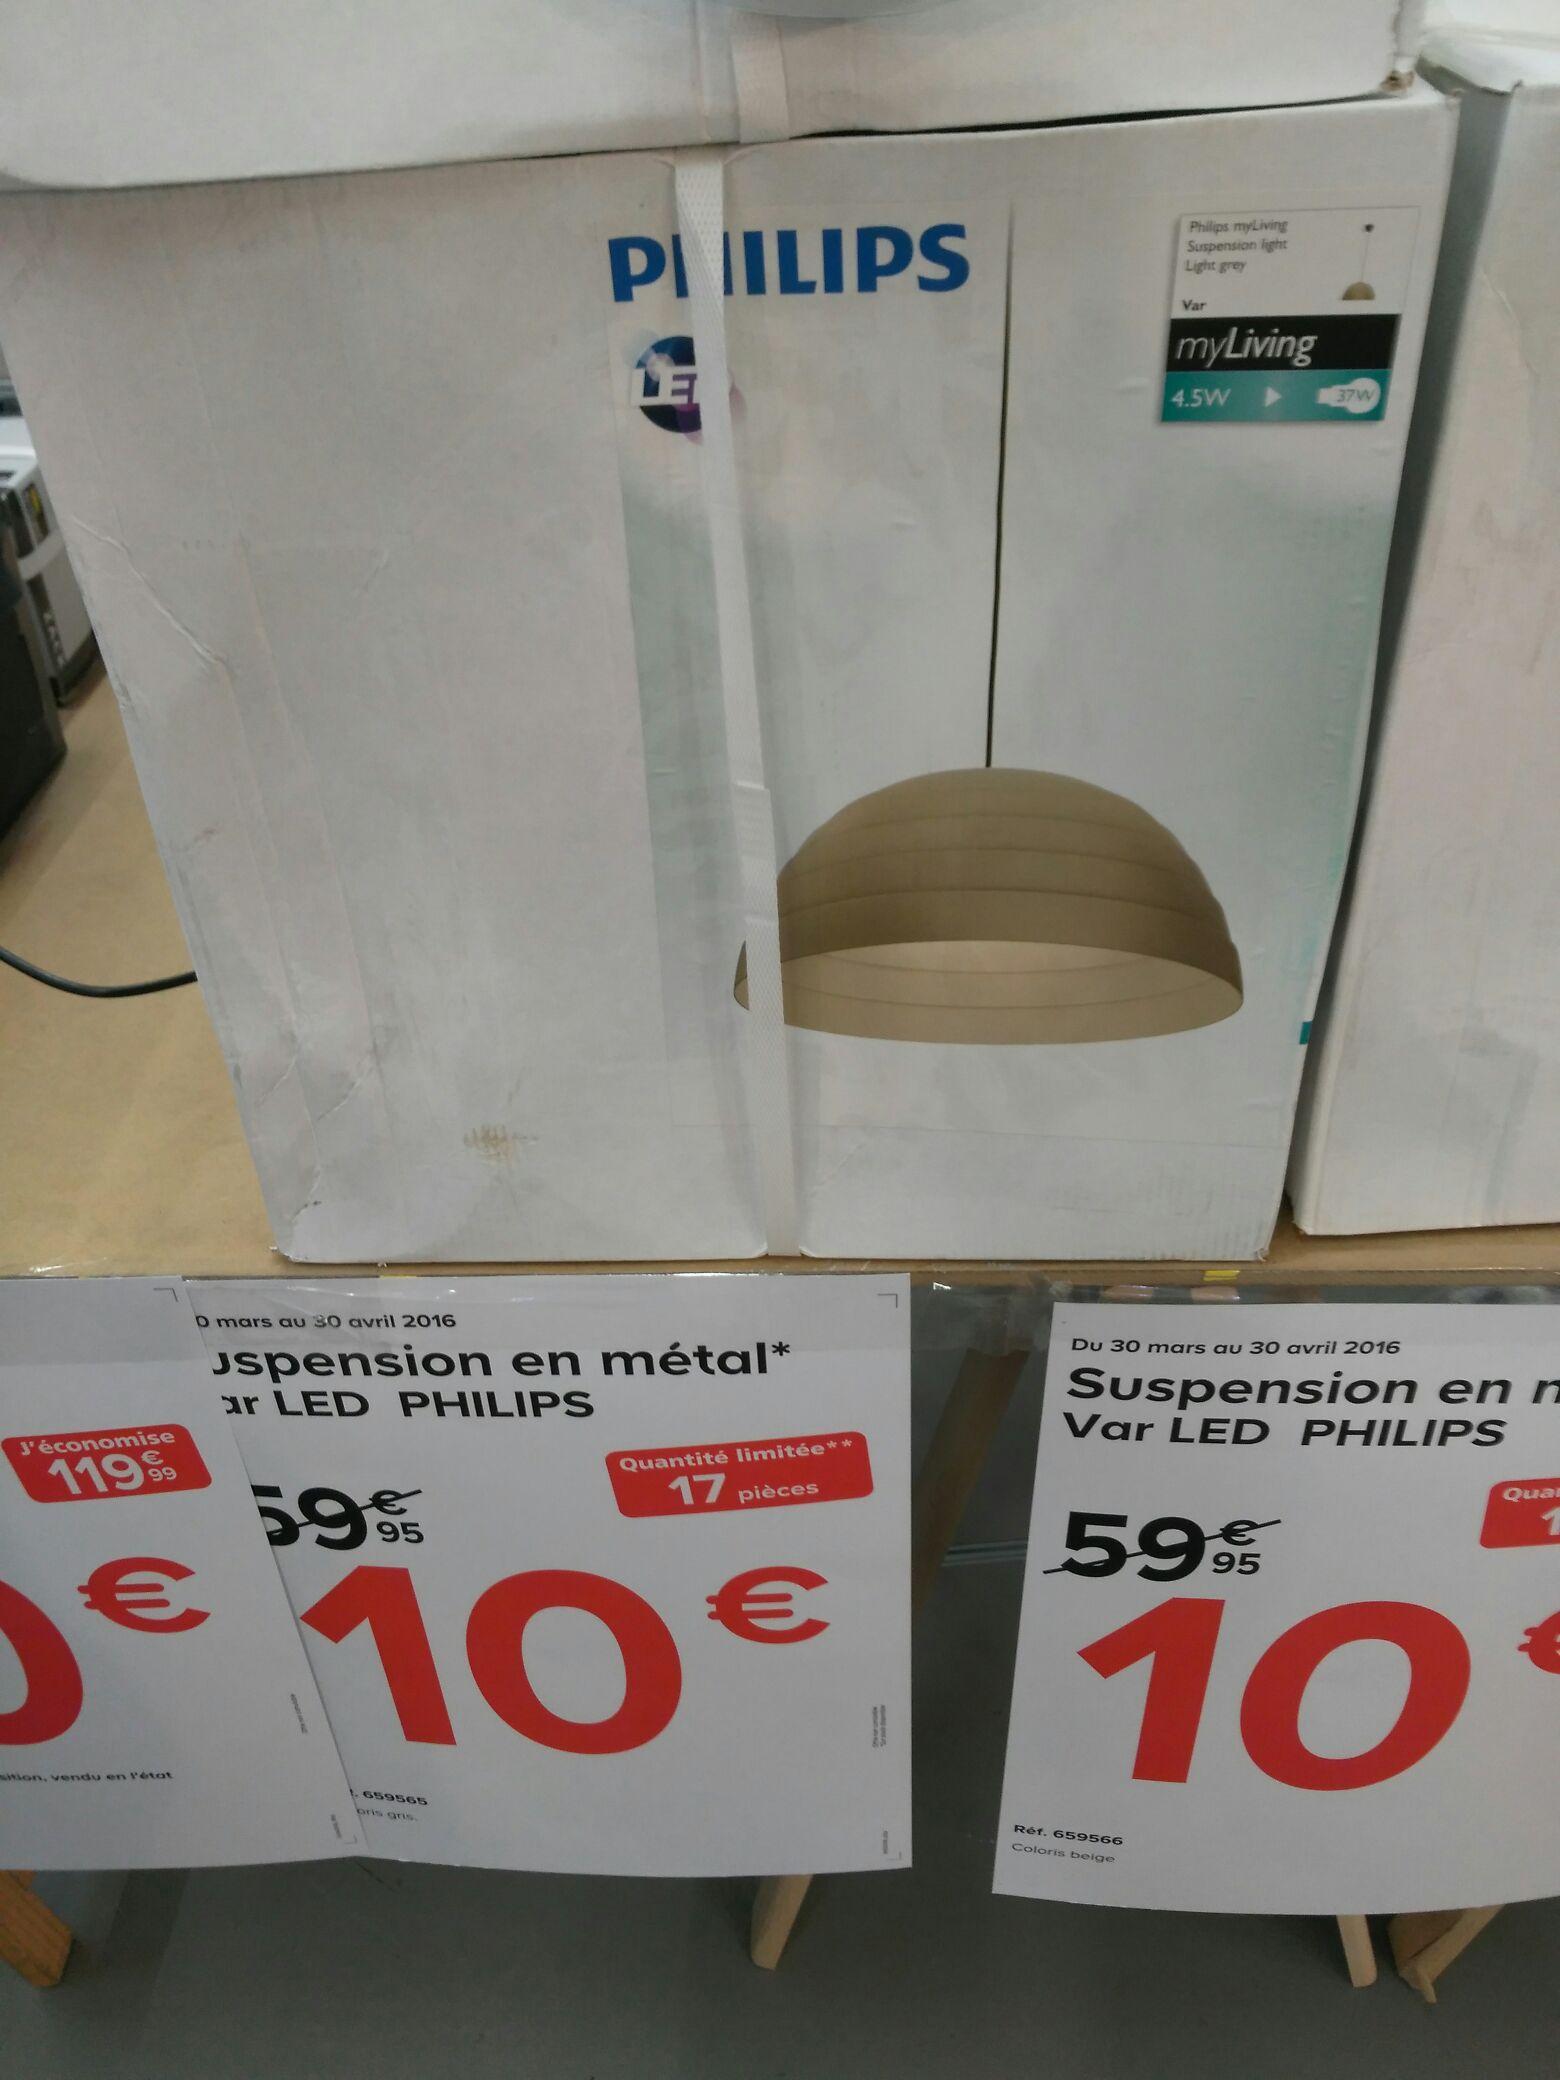 Suspension en métal LED Philips Var